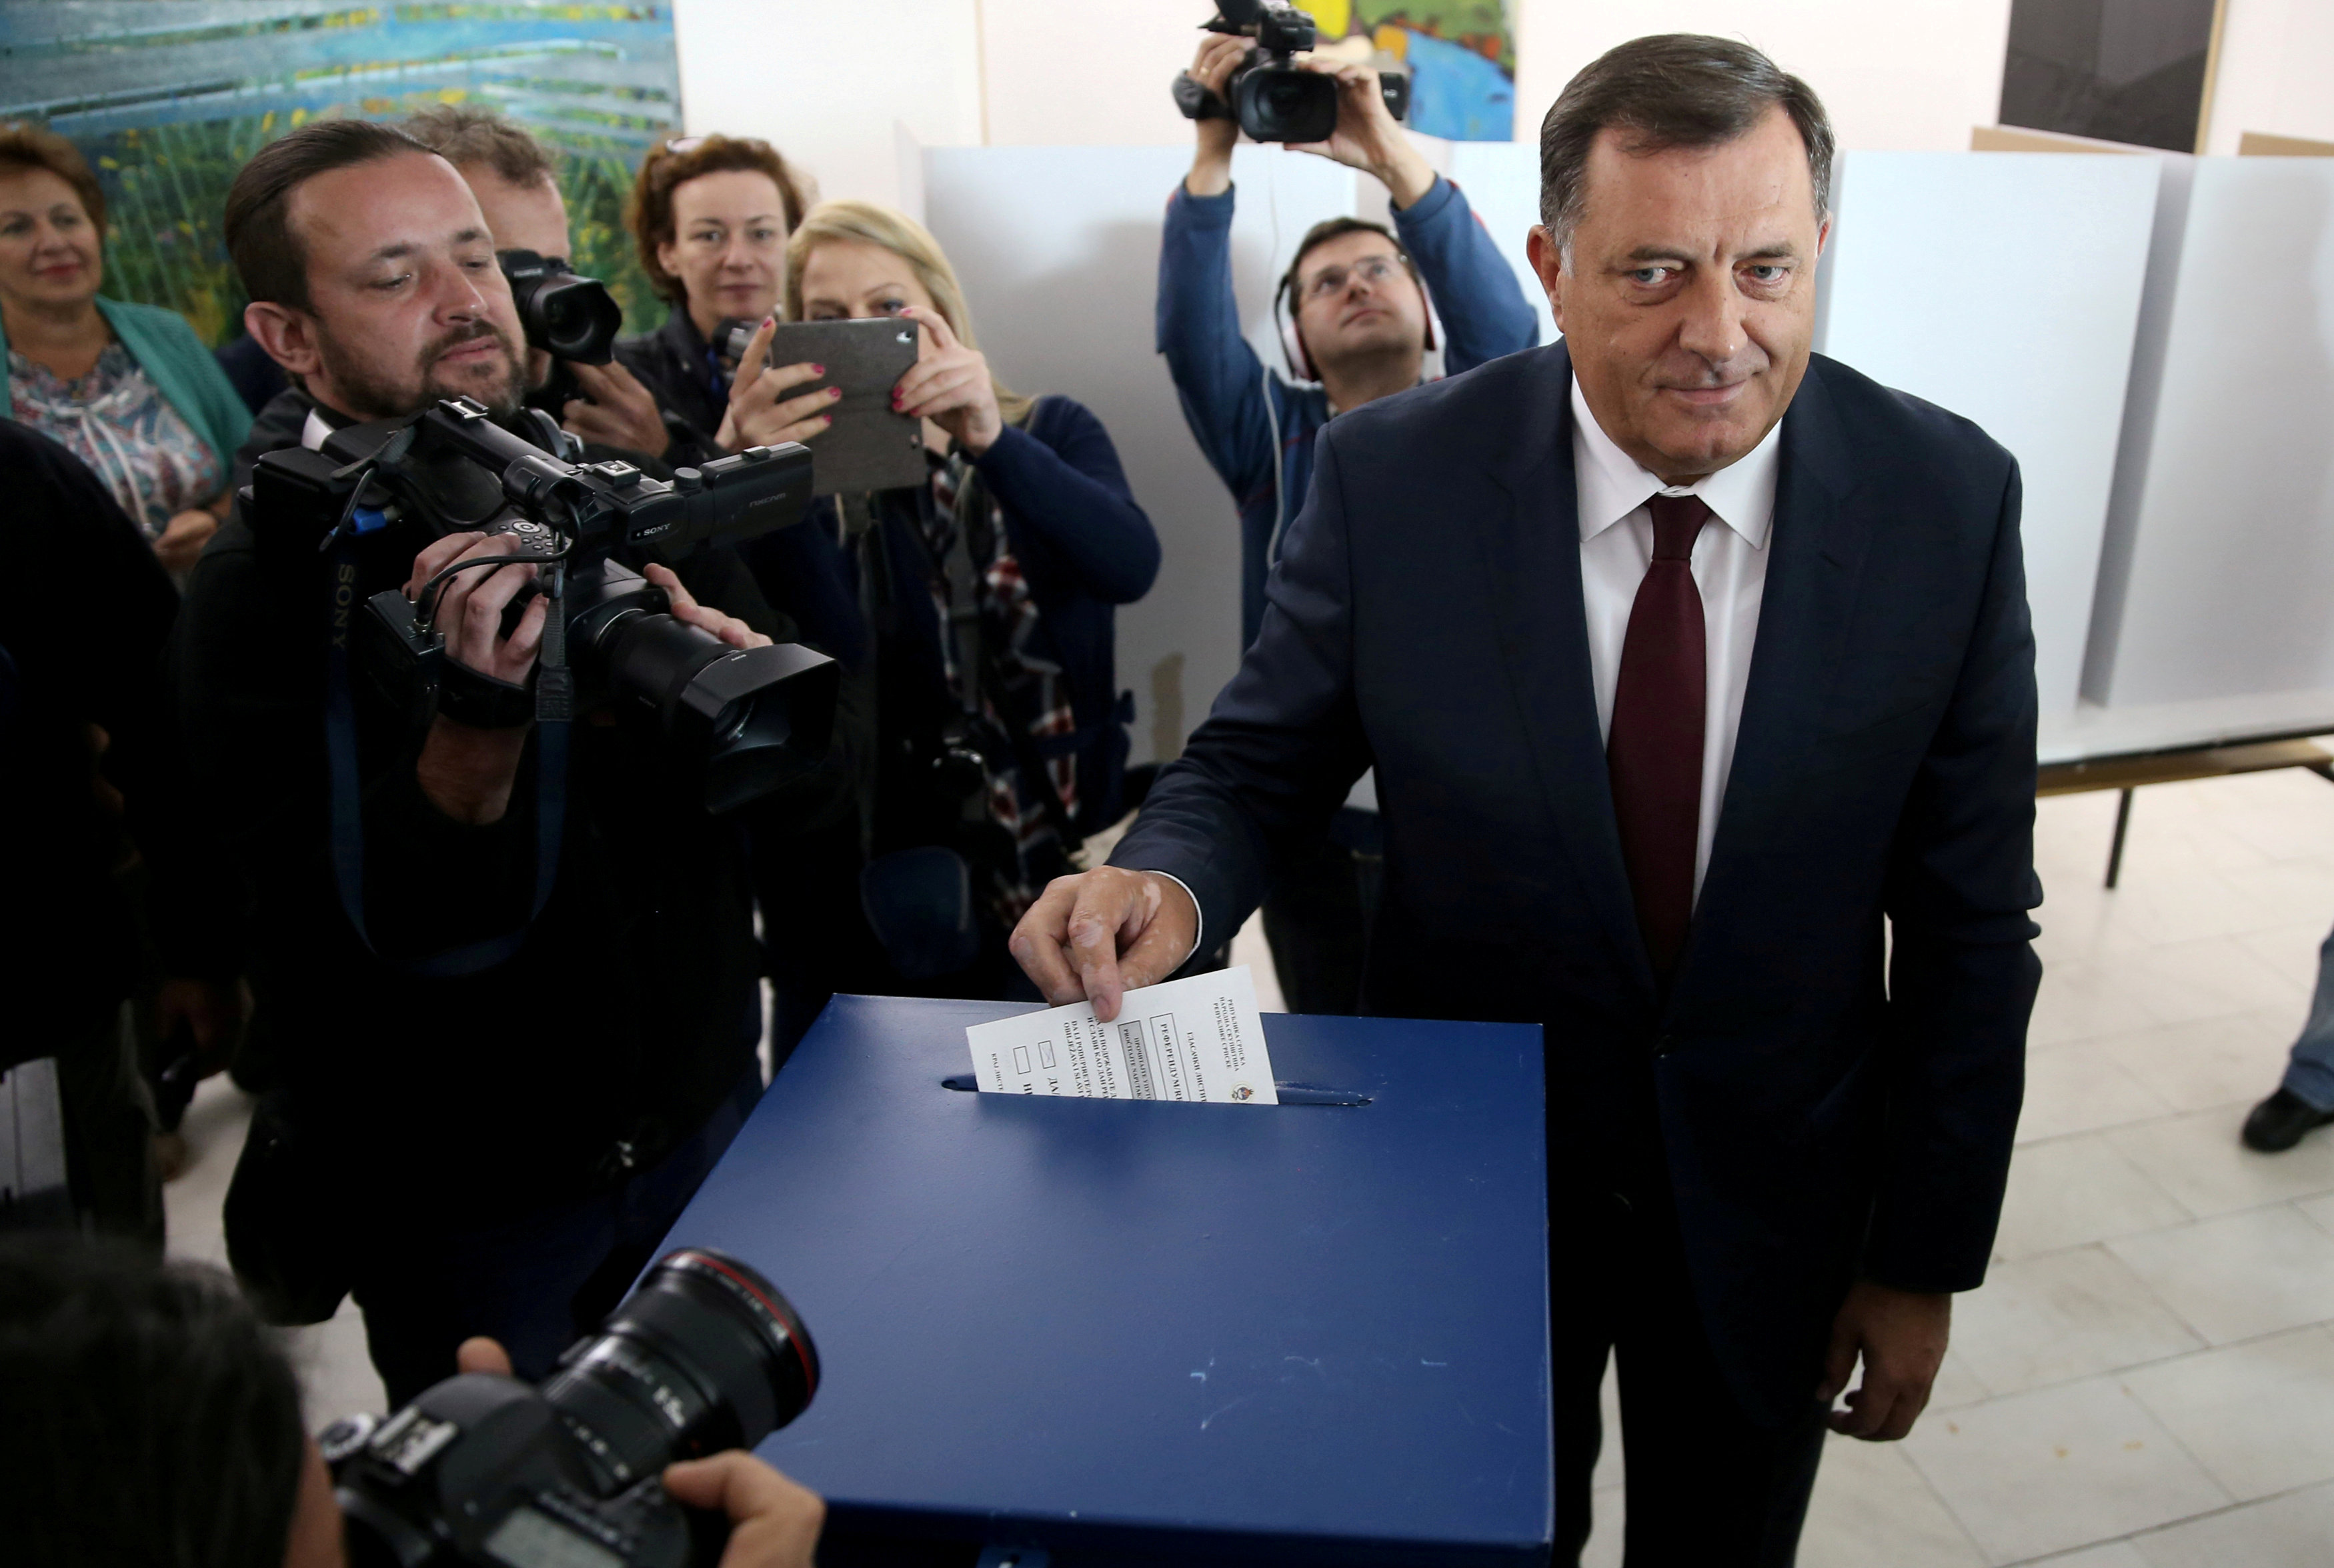 Bosnia: Leader accuses U.S. of meddling in elections